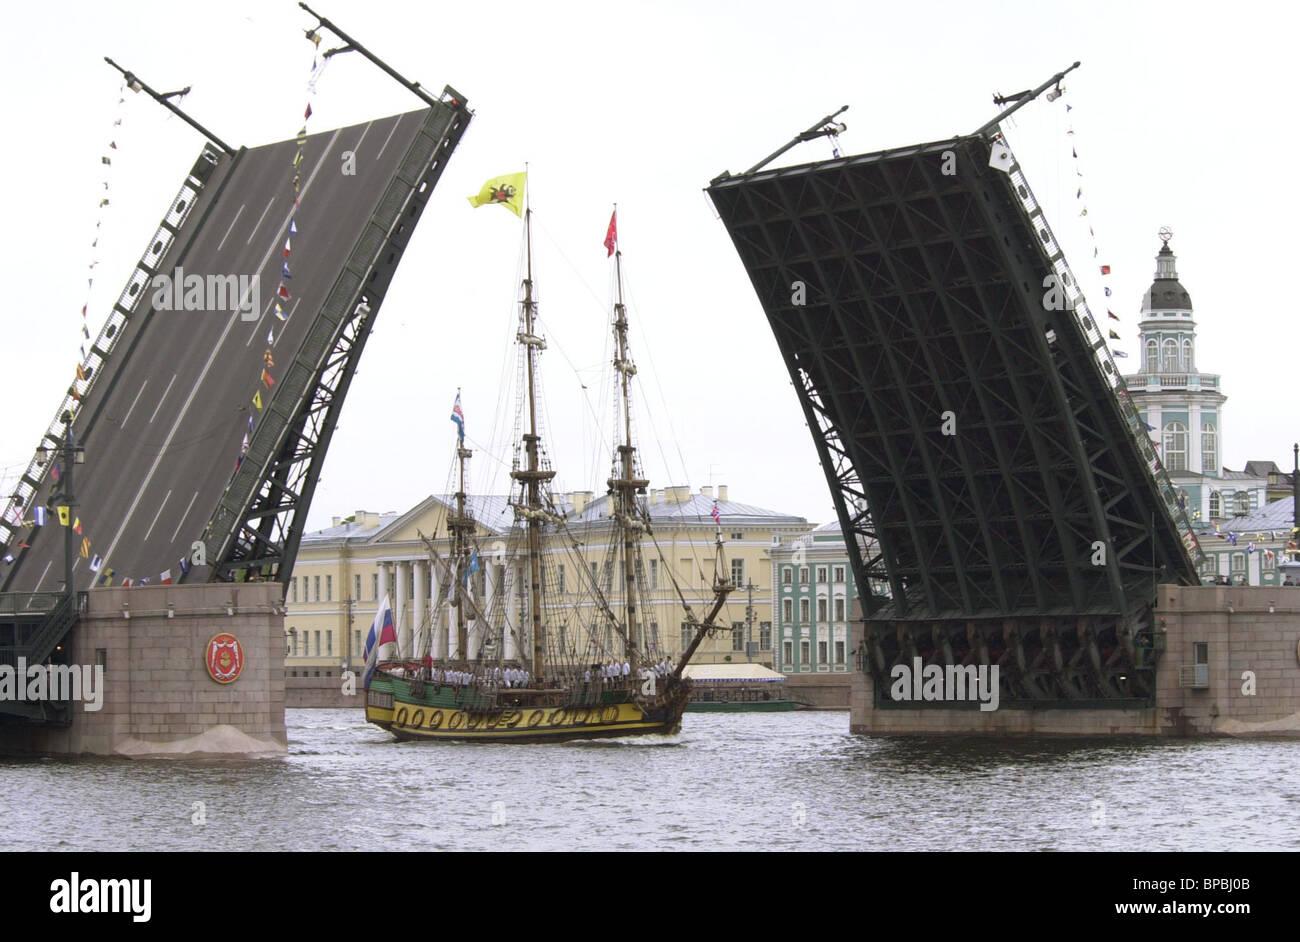 Aquatic musical performance in St. Petersburg - Stock Image